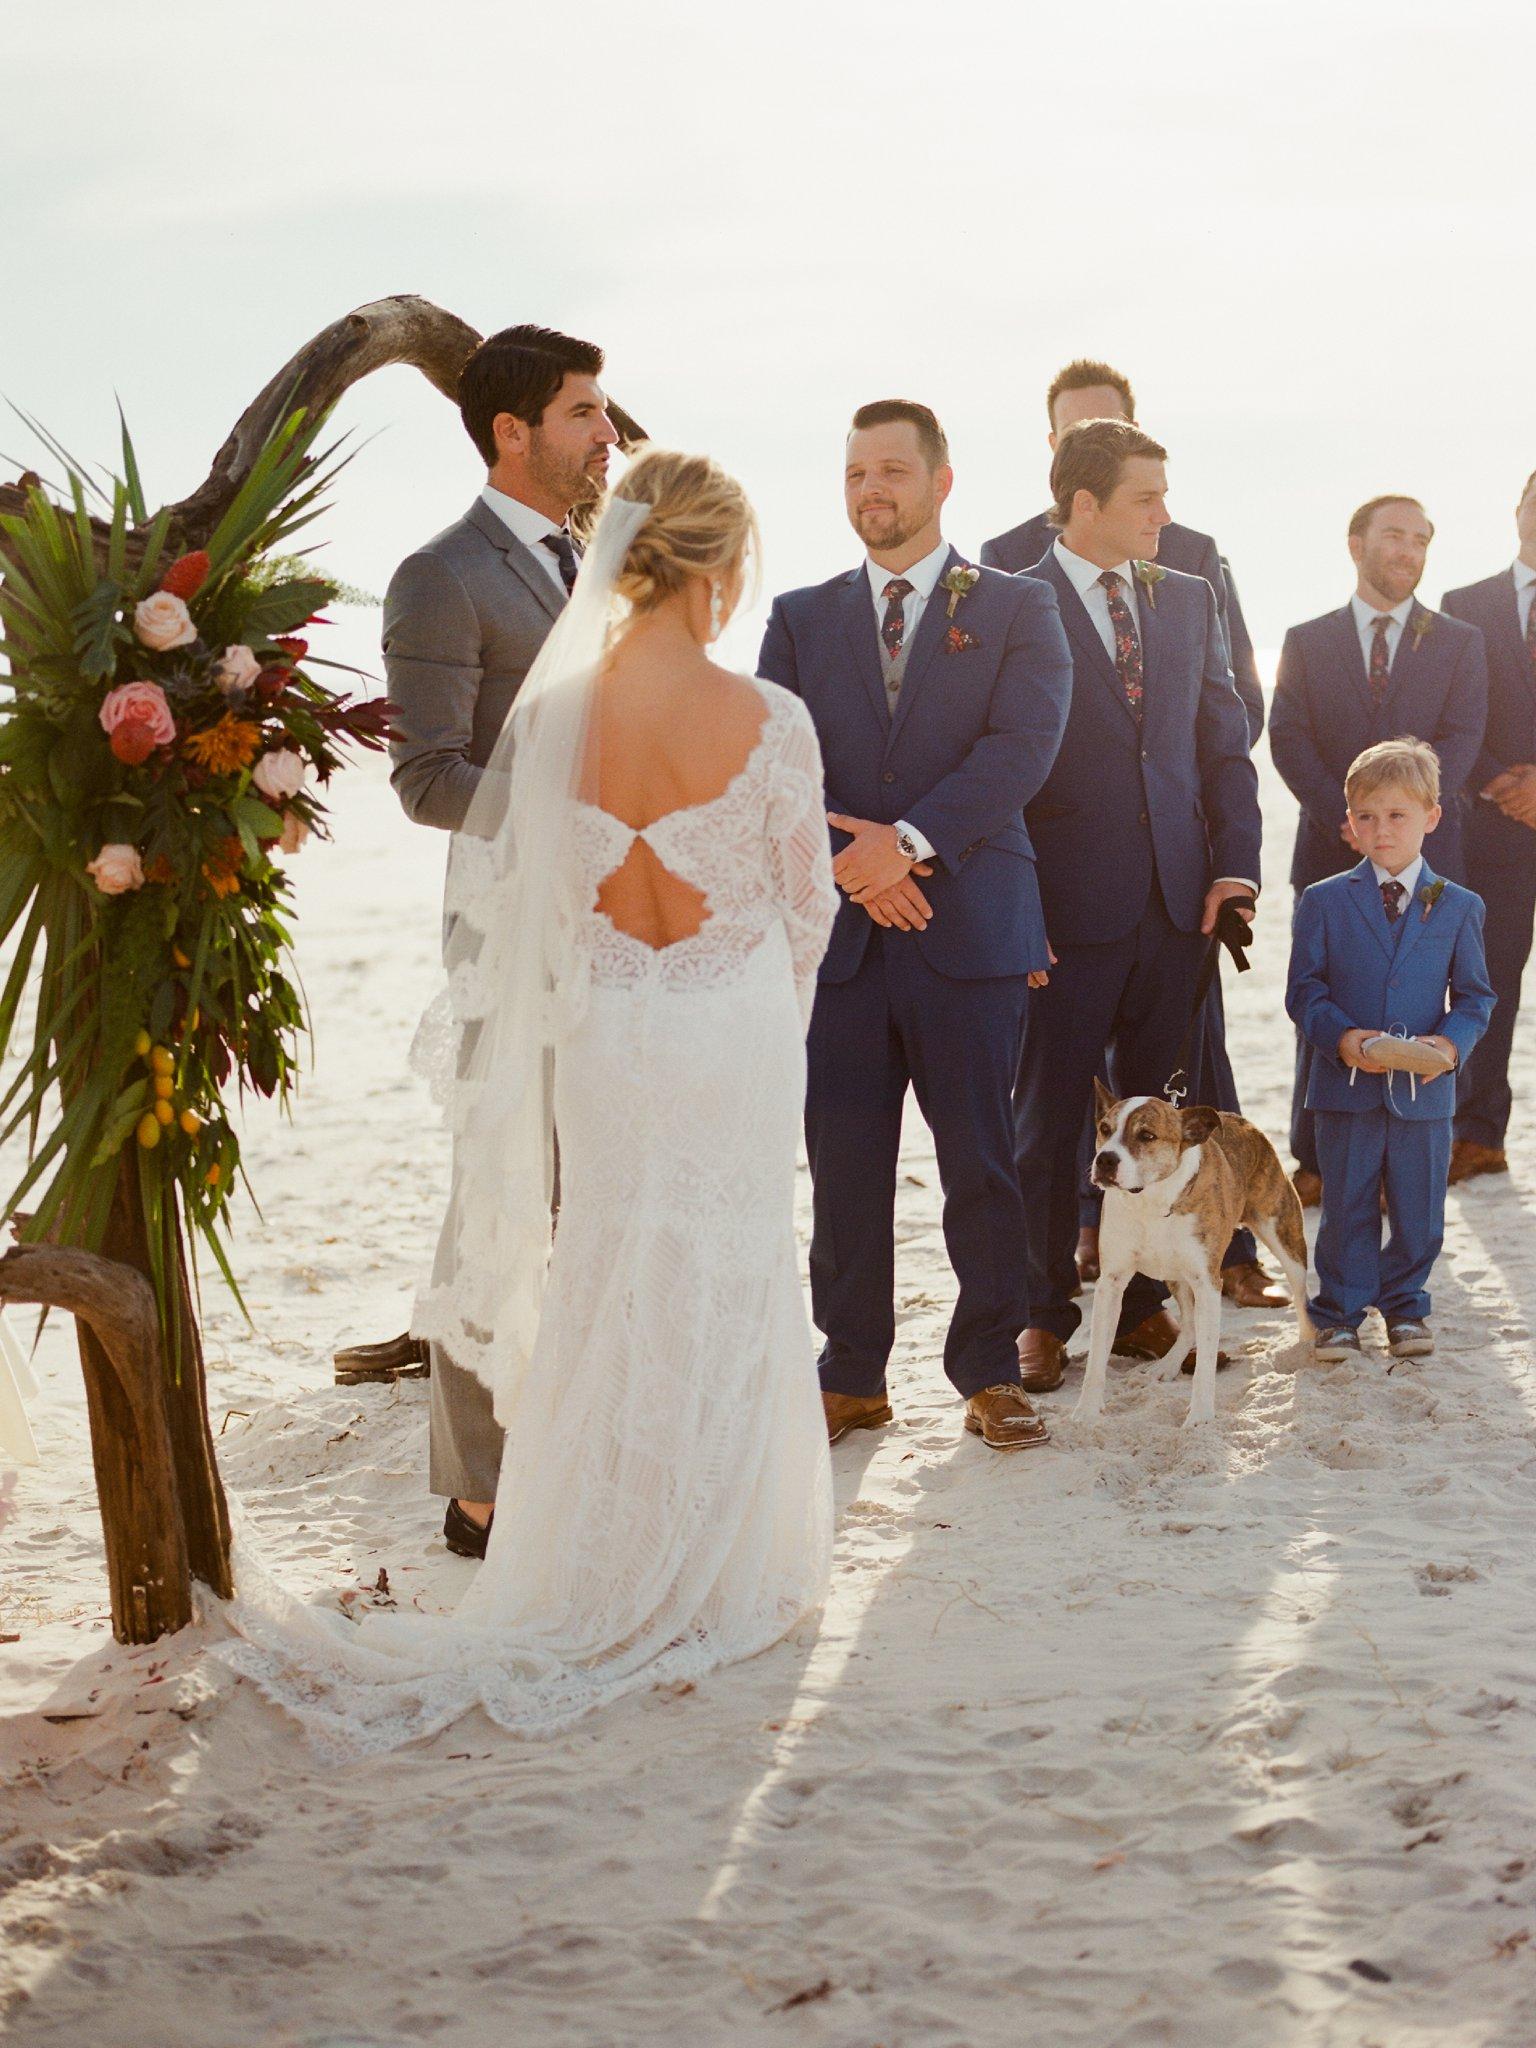 st+george+island+wedding+st+george+island+photographer+shannon+griffin+photography_0067.jpg